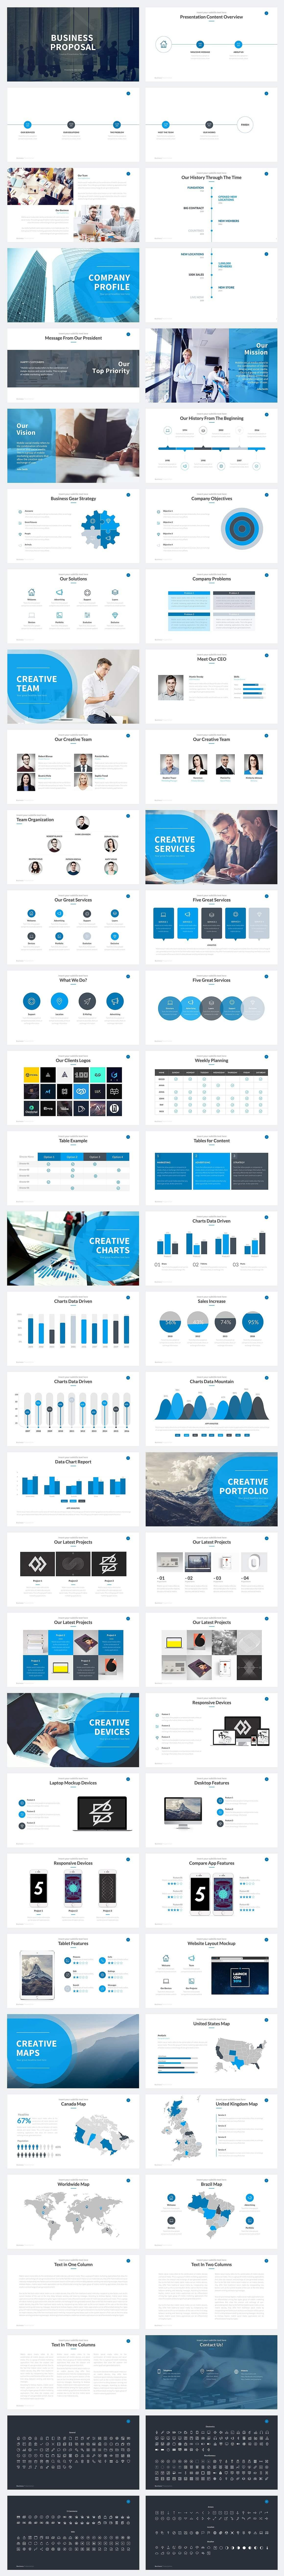 Business Google Slides Themes